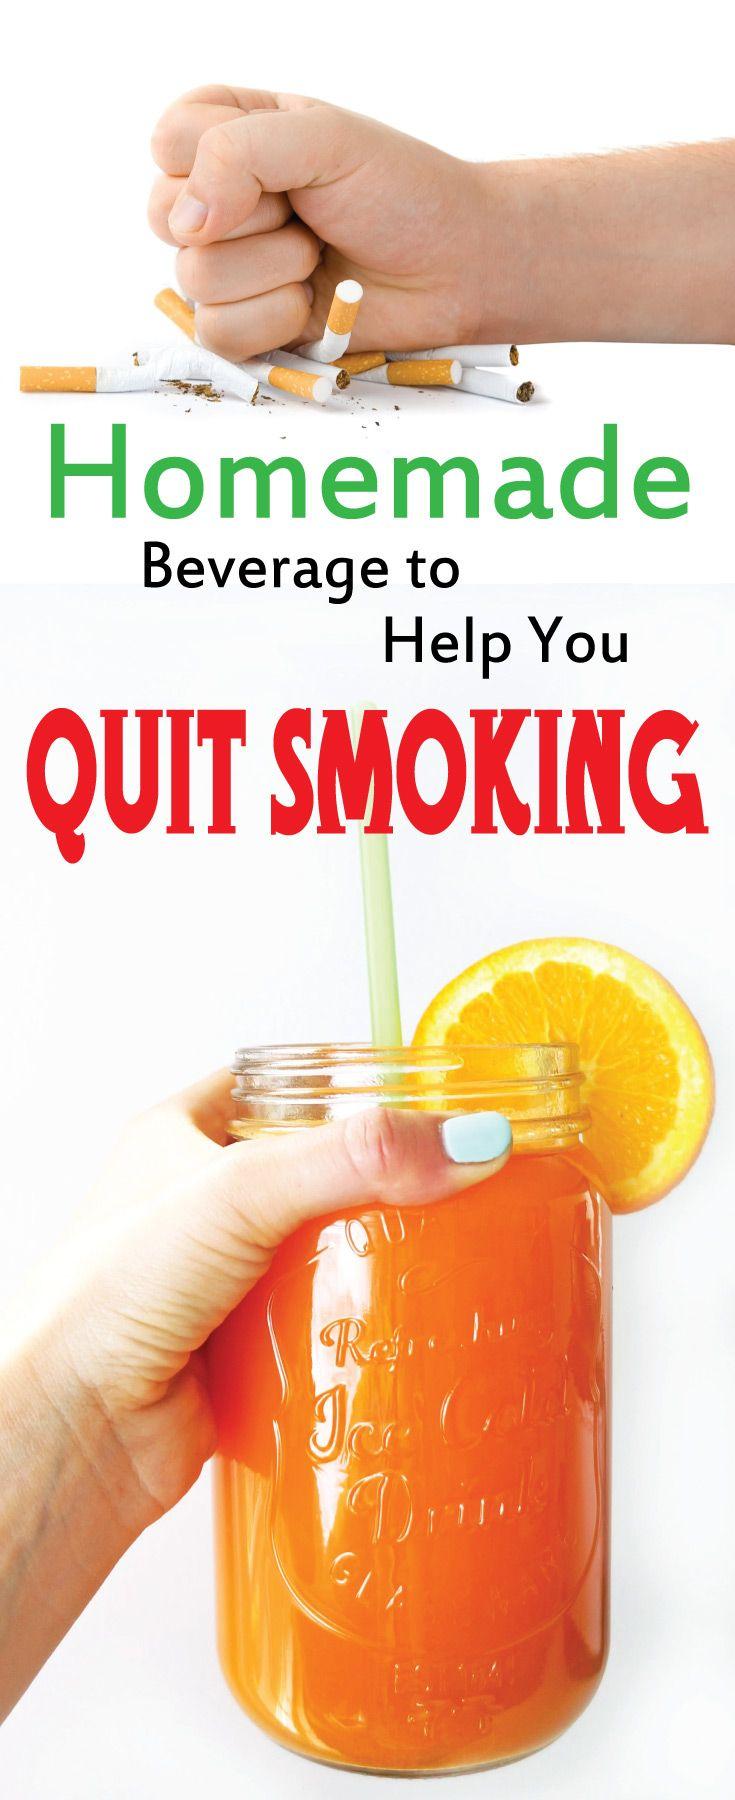 Homemade Beverage to help you QUIT SMOKING - Peek-ITPeek-IT